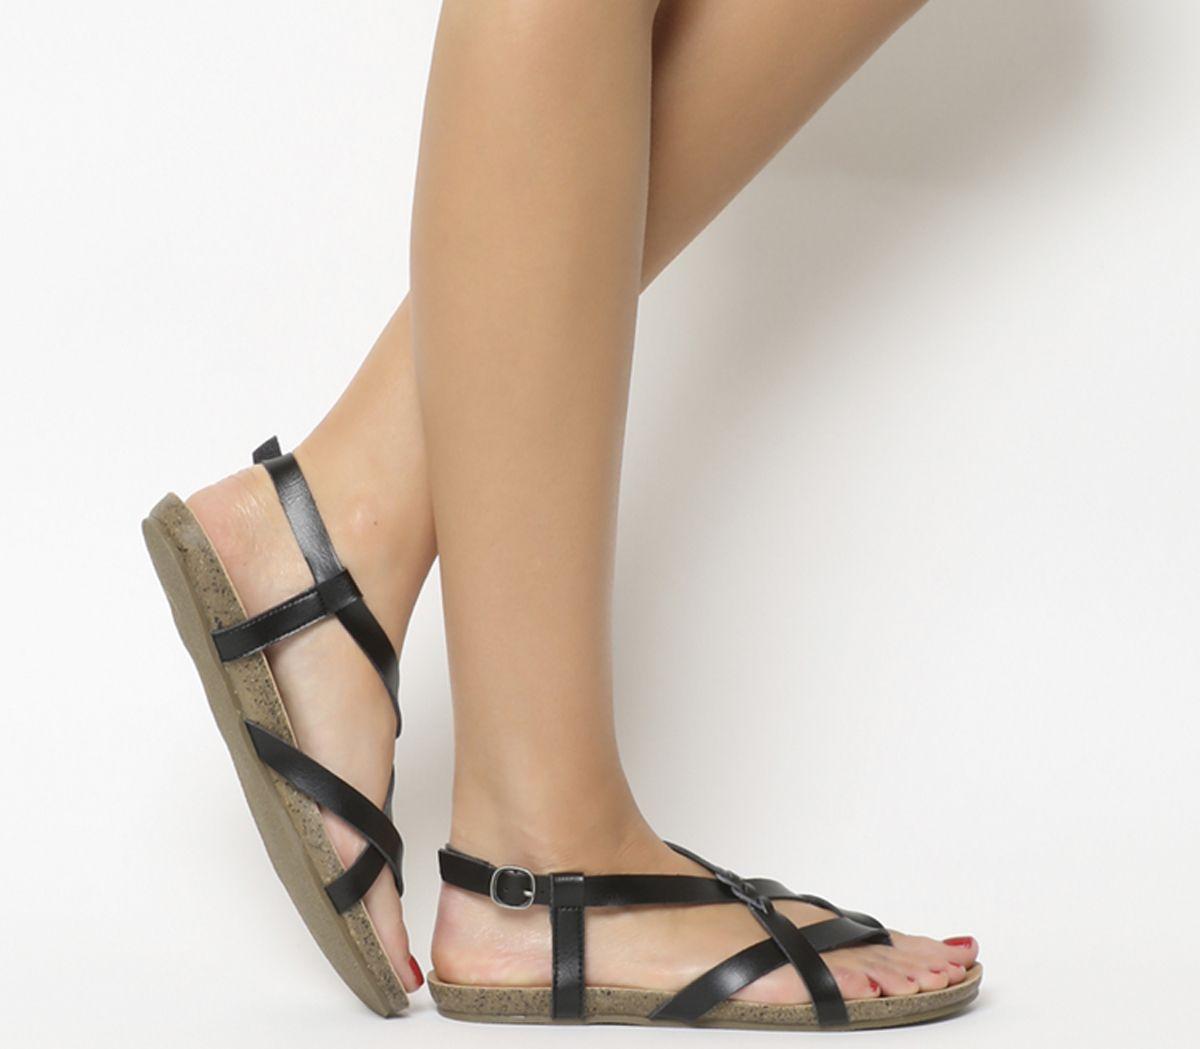 cfab92ca06195 Details about Womens Blowfish Granola B Sandals Black Dye Cut Sandals